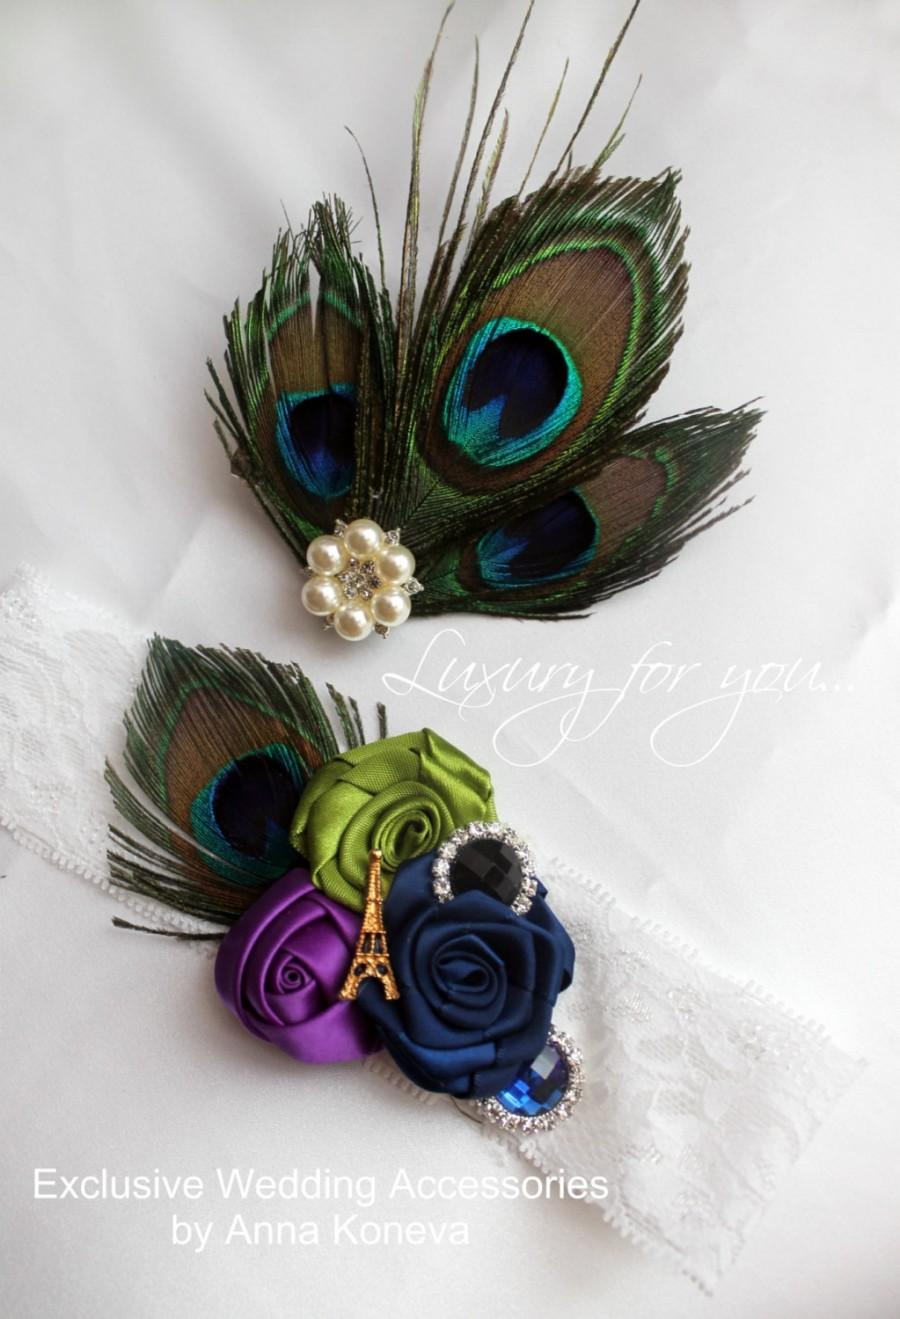 Hochzeit - Wedding garter peacock feather, peacock, garter bride, garter, white. Wedding accessories, jewelry, barrette, garters